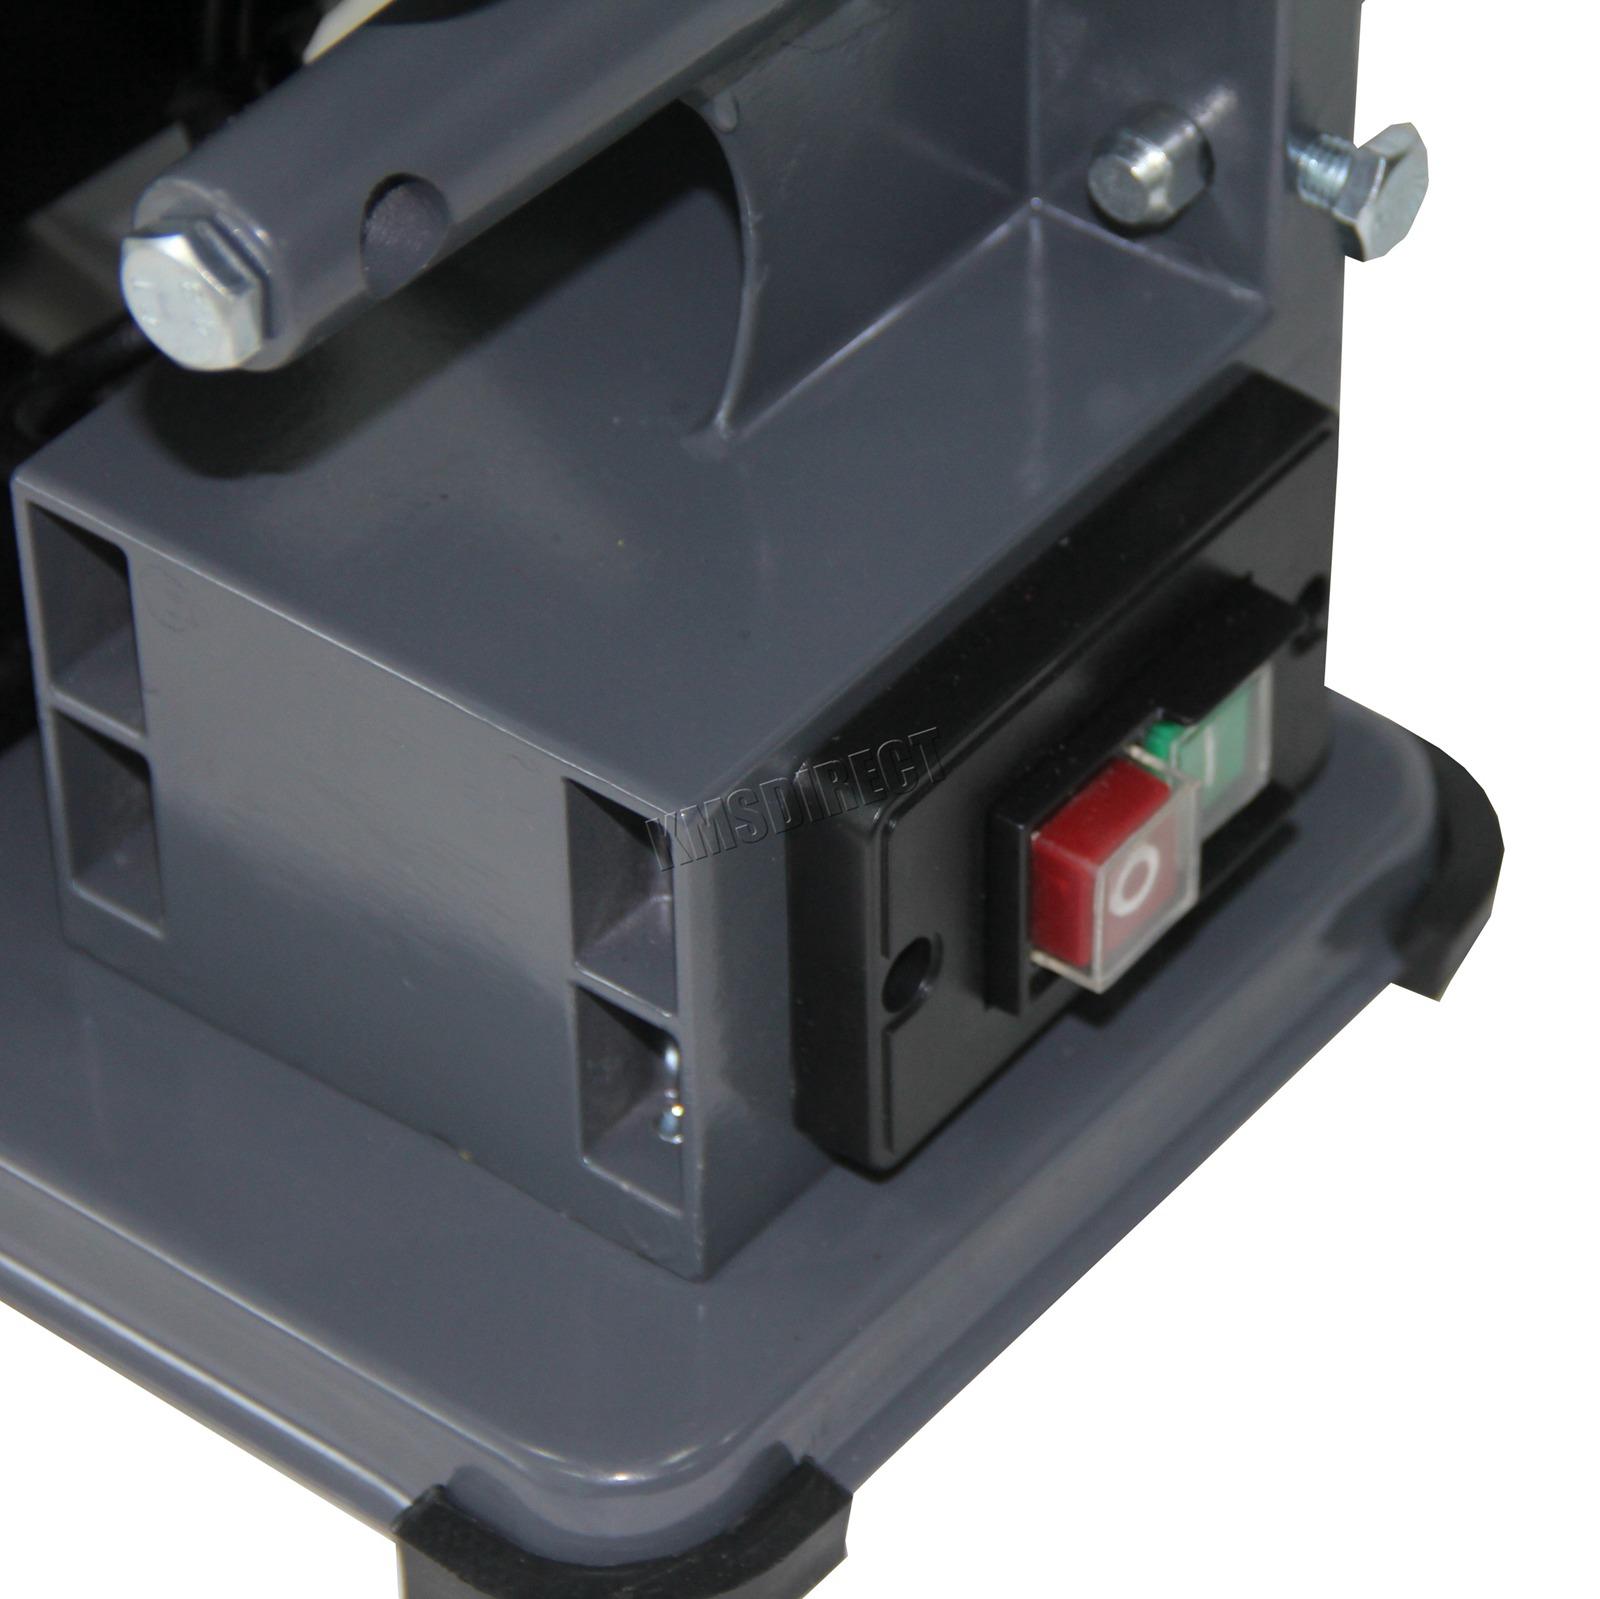 SwitZer Heavy Duty Sander Belt and Disc Bench Linisher Tilting Machine Tool Standing Grinder 375W 230V SBD01 Grey